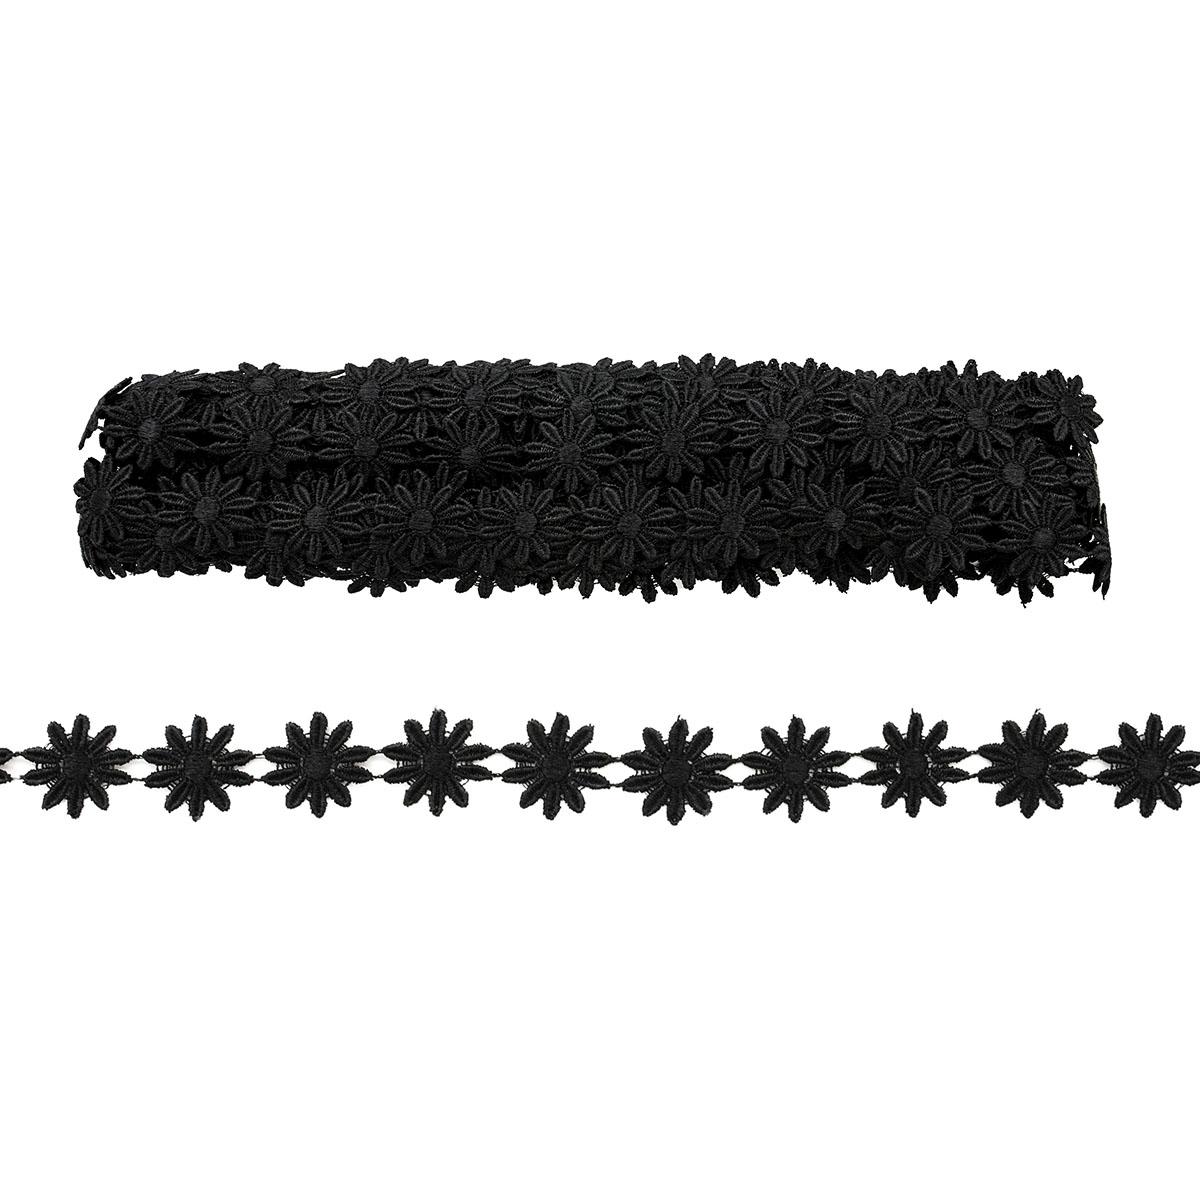 3523 Кружево вязаное, 2,5 см*9 м, 'Астра'